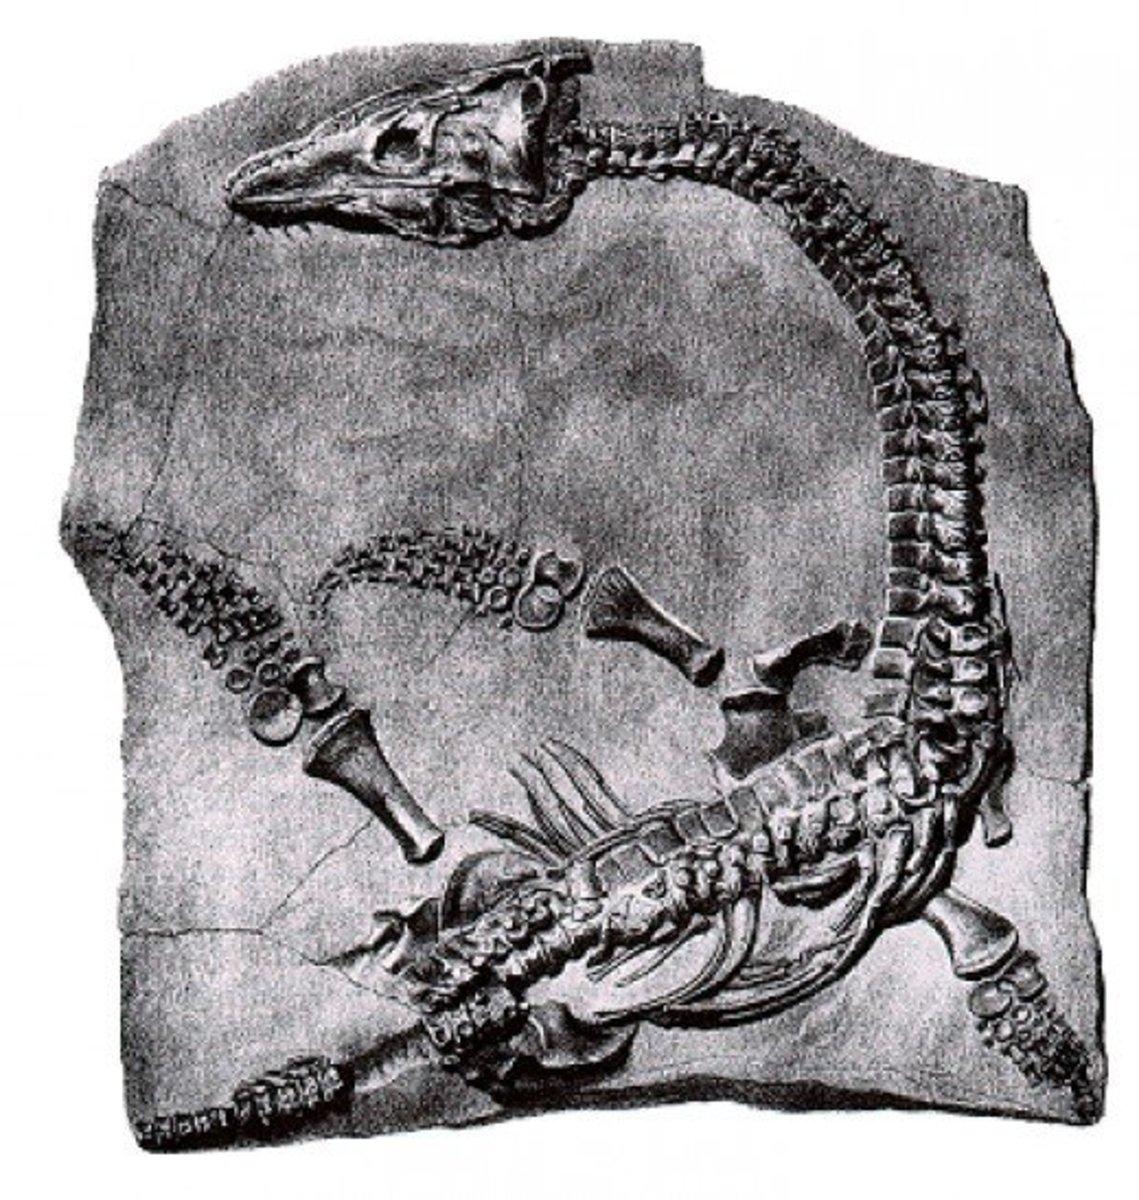 Embedded Plesiosaurus Fossil